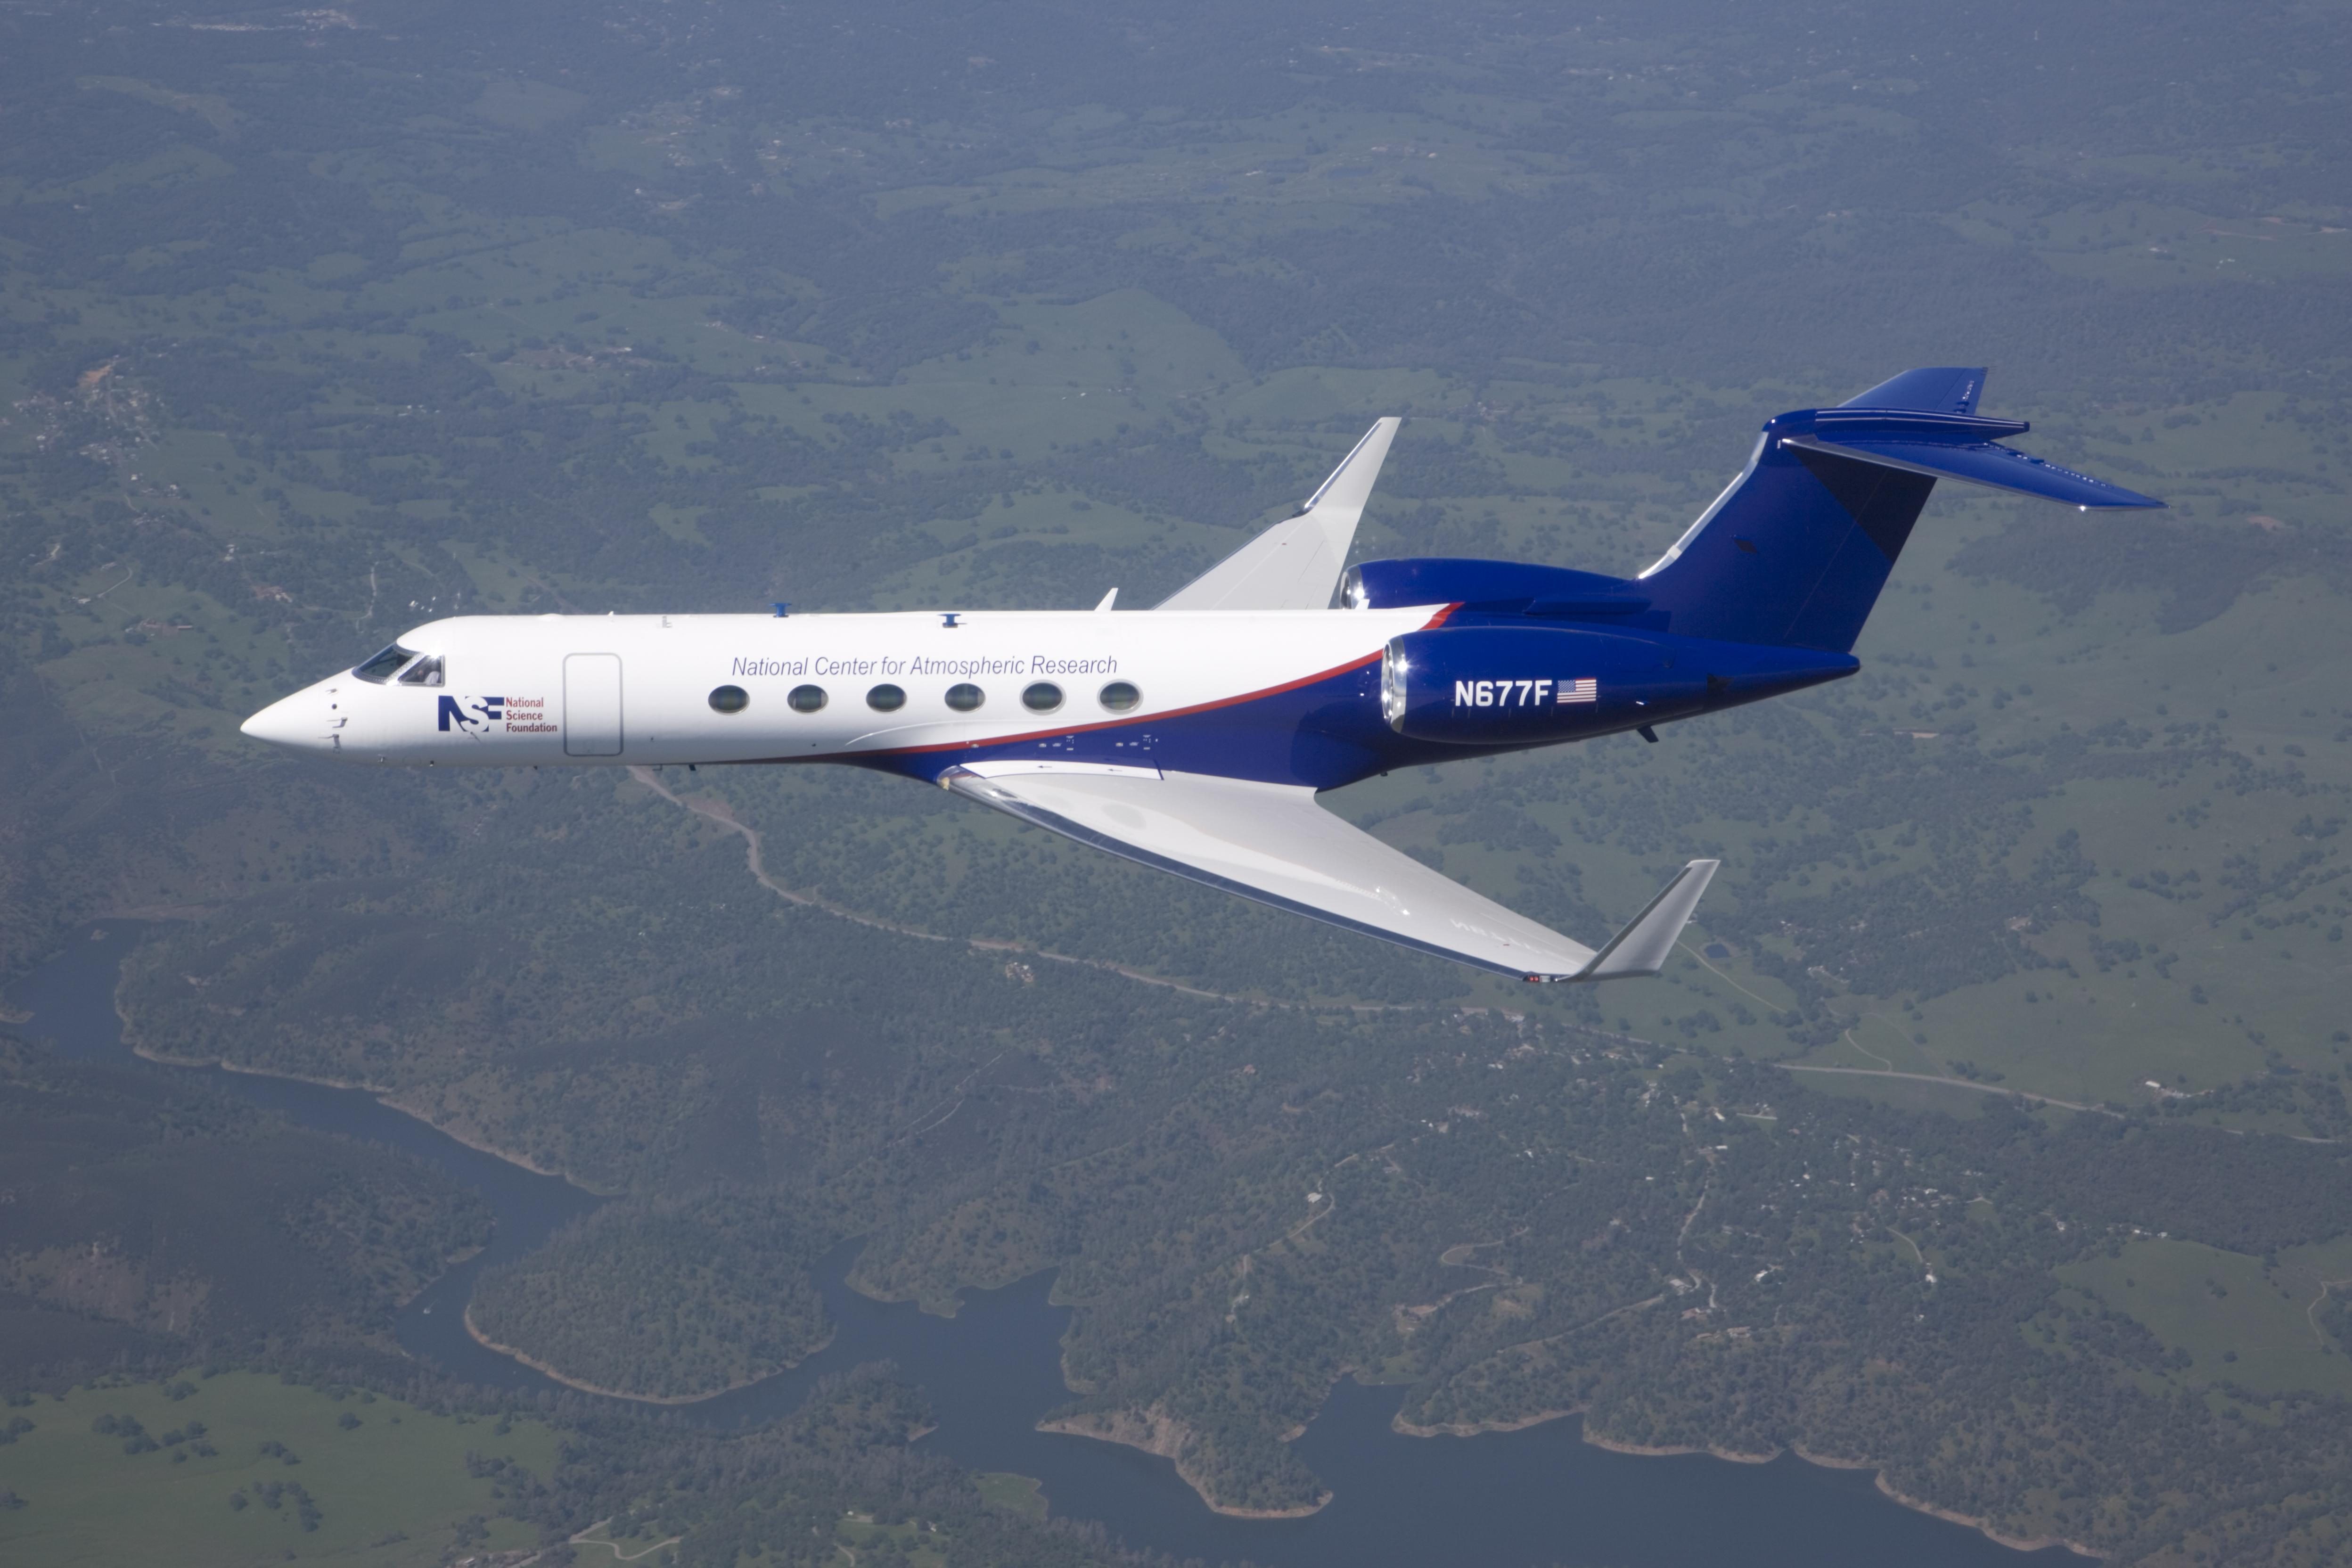 NSF/NCAR Gulfstream V Research Aircraft | NASA